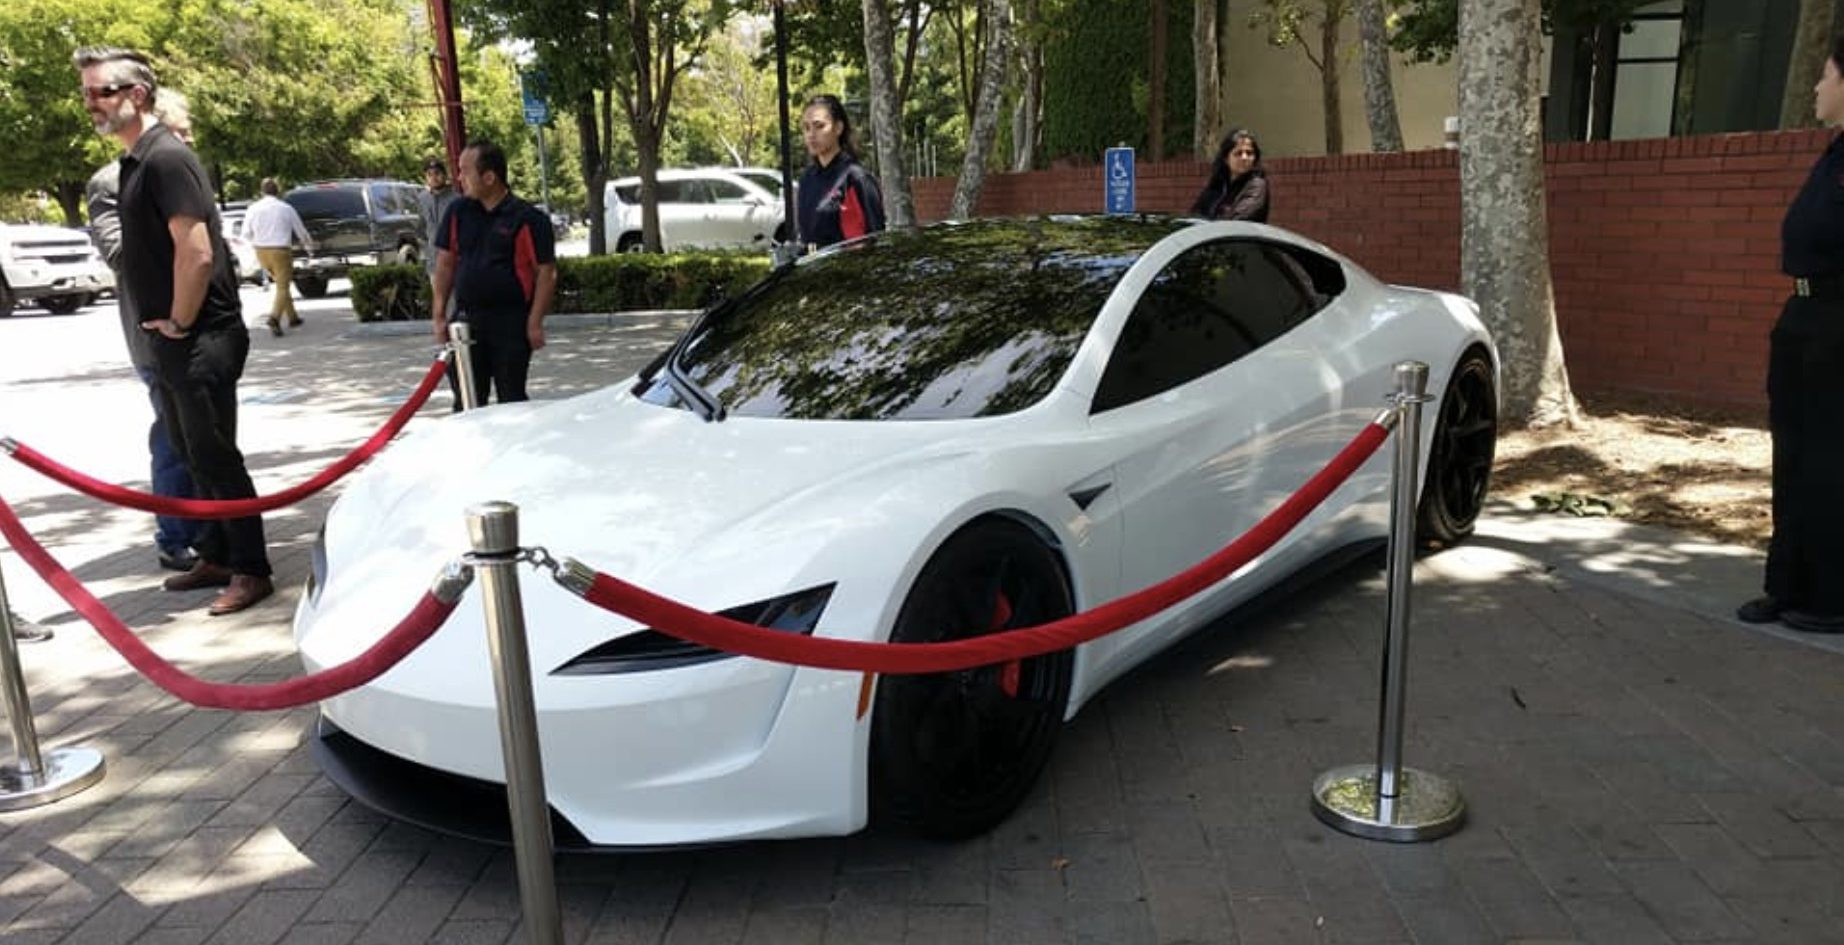 Tesla unveils new white next-gen Roadster prototype at shareholder meeting